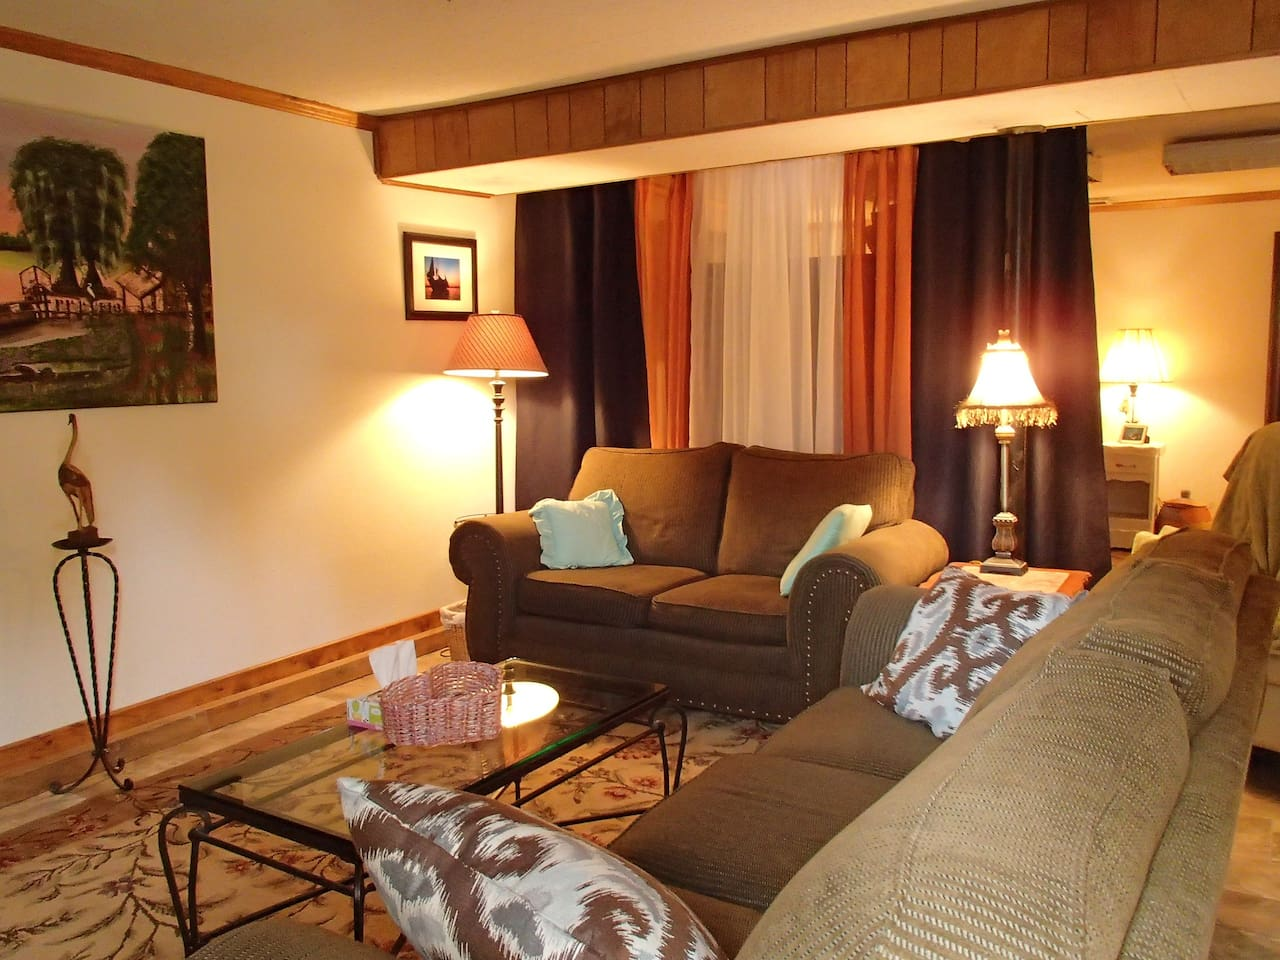 Garden View Flat In Heart of Fayetteville! - Lofts for Rent in ...